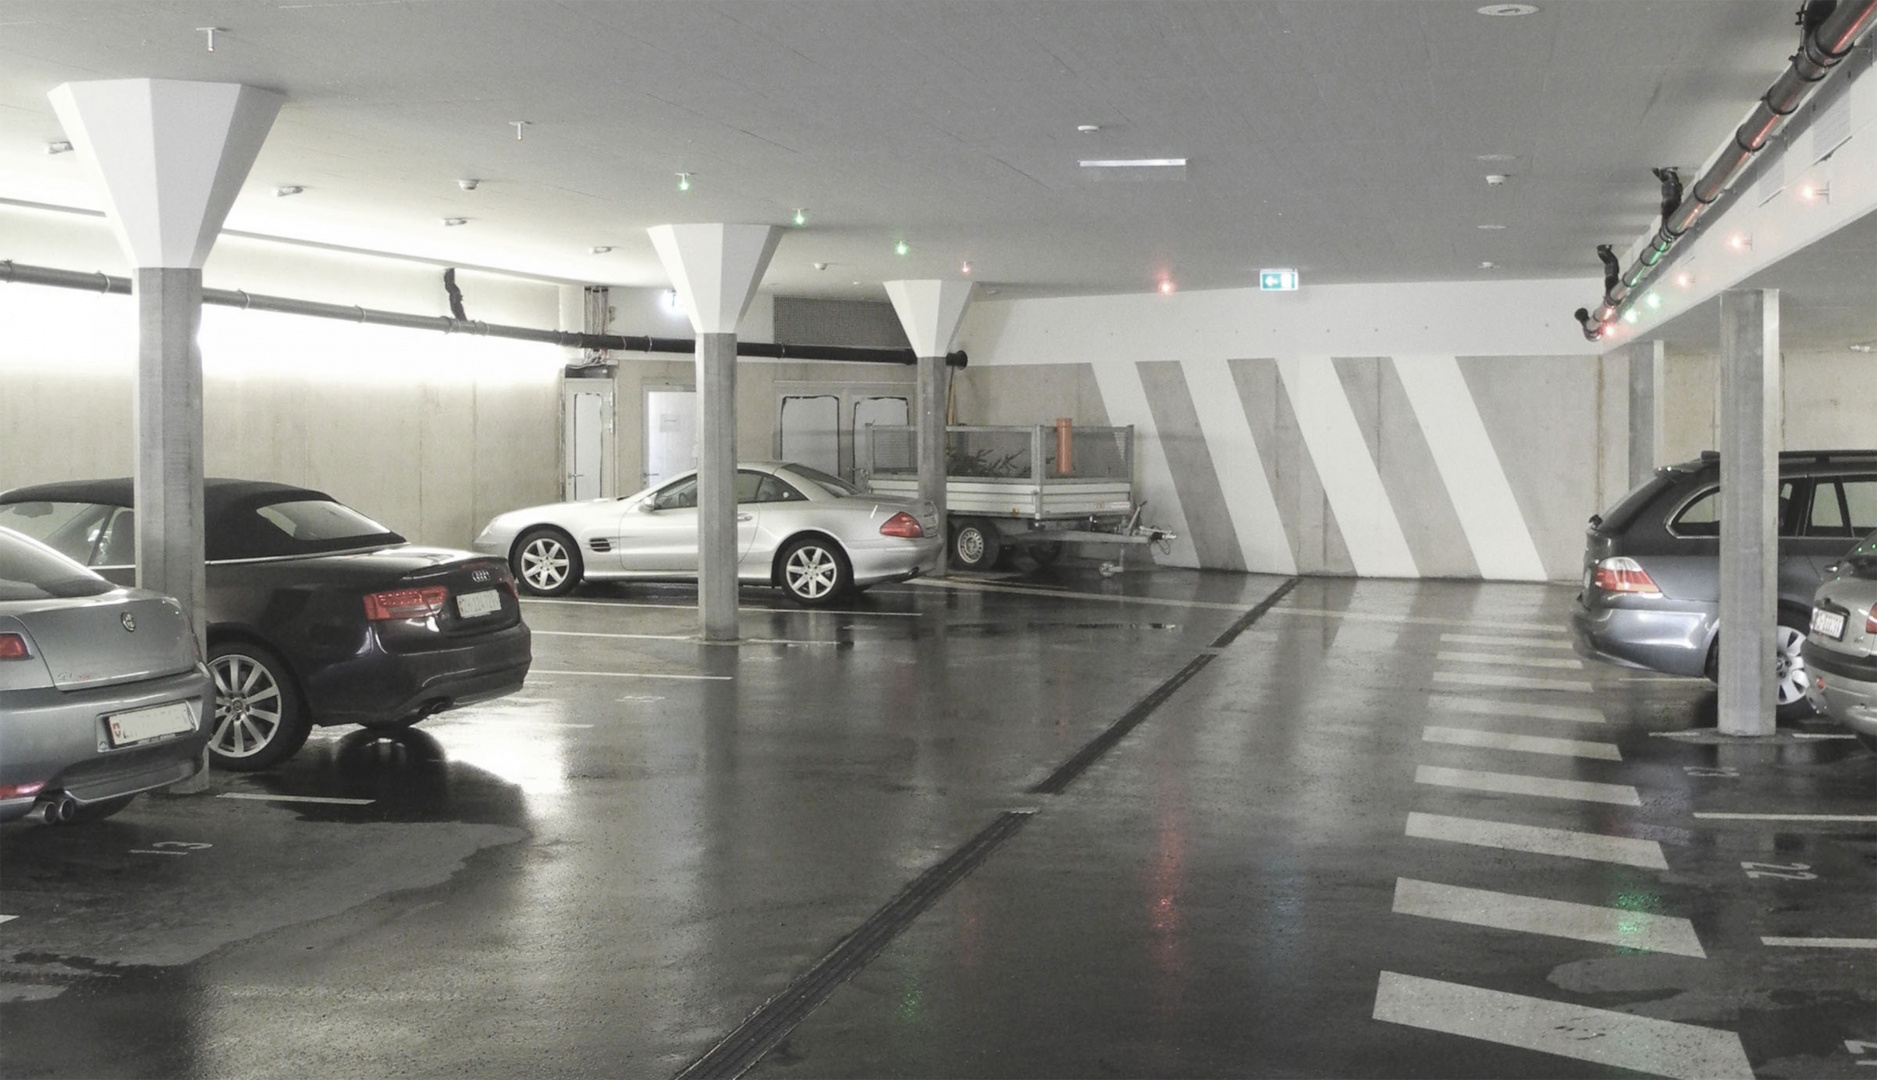 Untere Parkingebene © Patrick Roost Planung Architektur GmbH